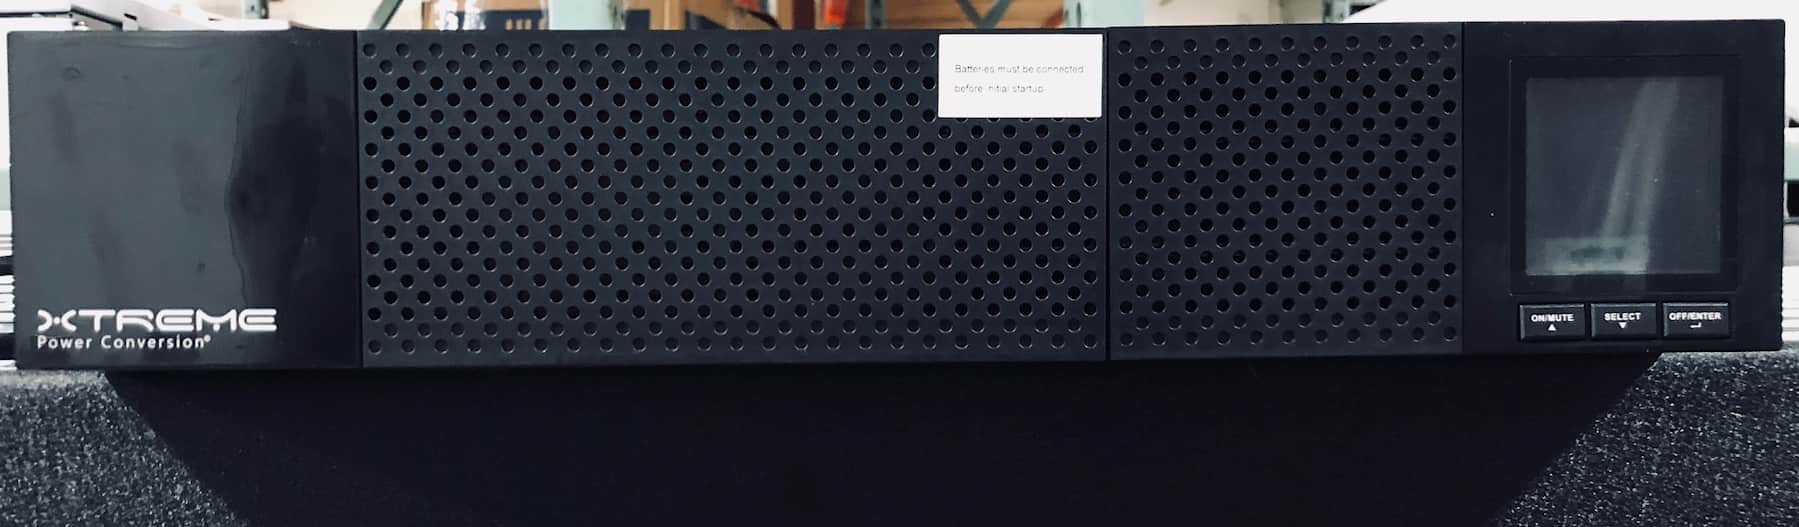 MaxPower P90-1500, 1.5kVA Online Power Conditioning UPS